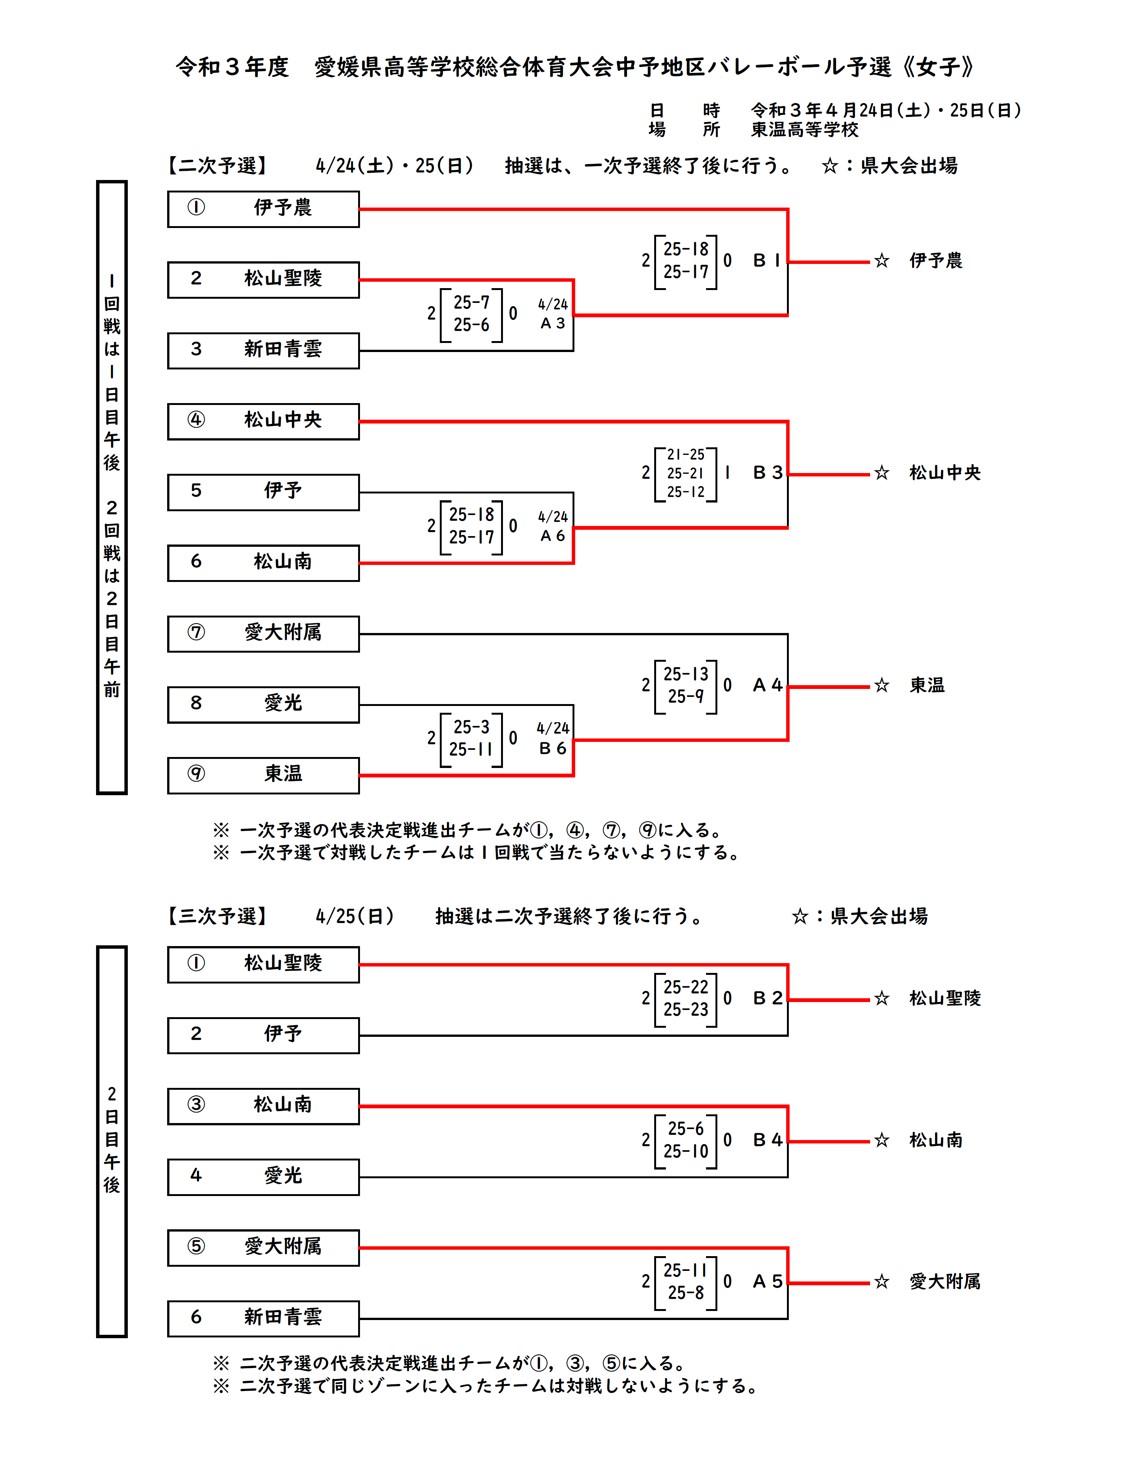 2021年度_インターハイ予選_愛媛県_中予地区_女子_結果2